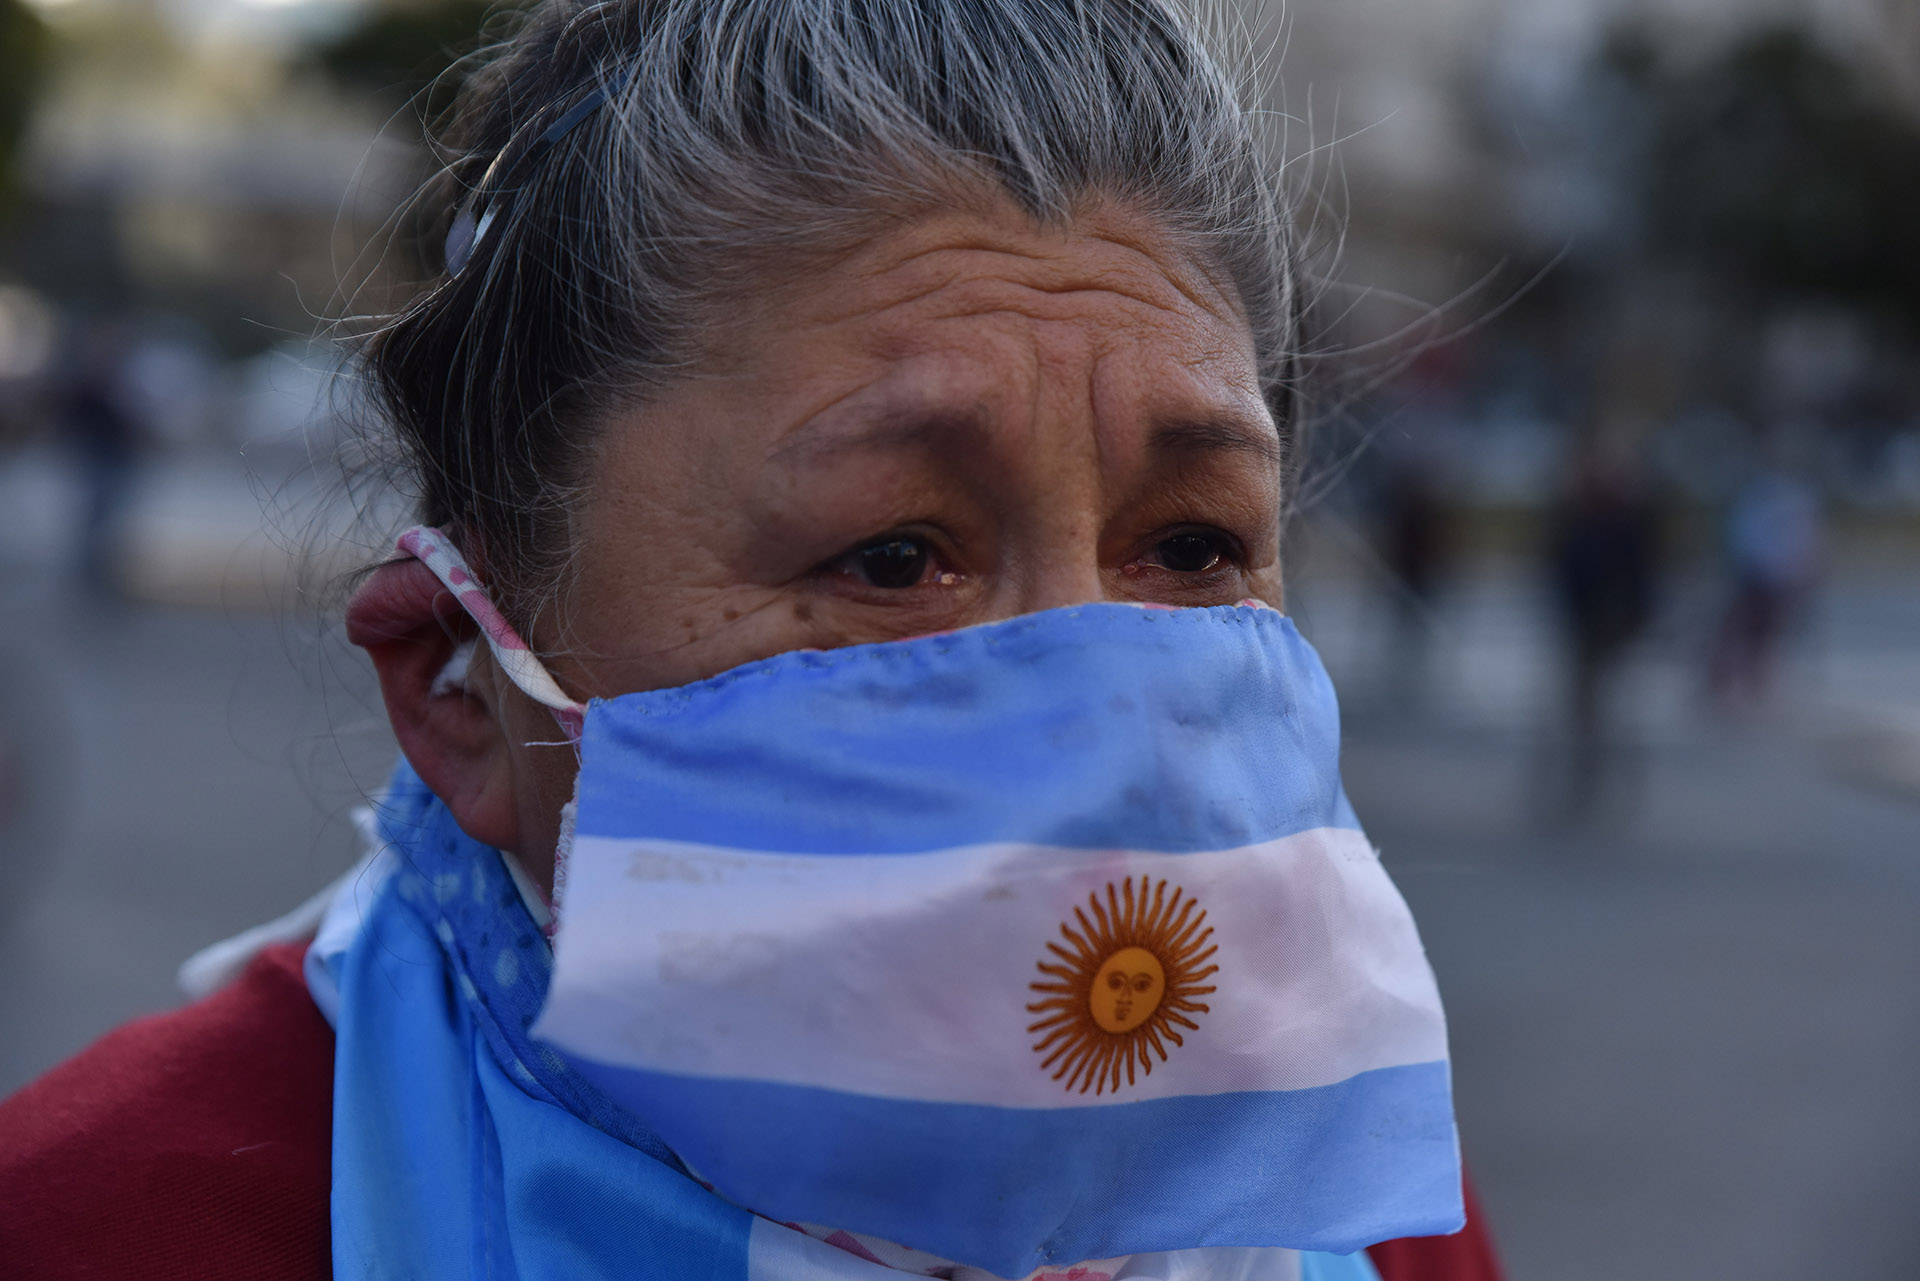 En la Capital Federal la gente salió a la calle a manifestarse pese a la cuarentena